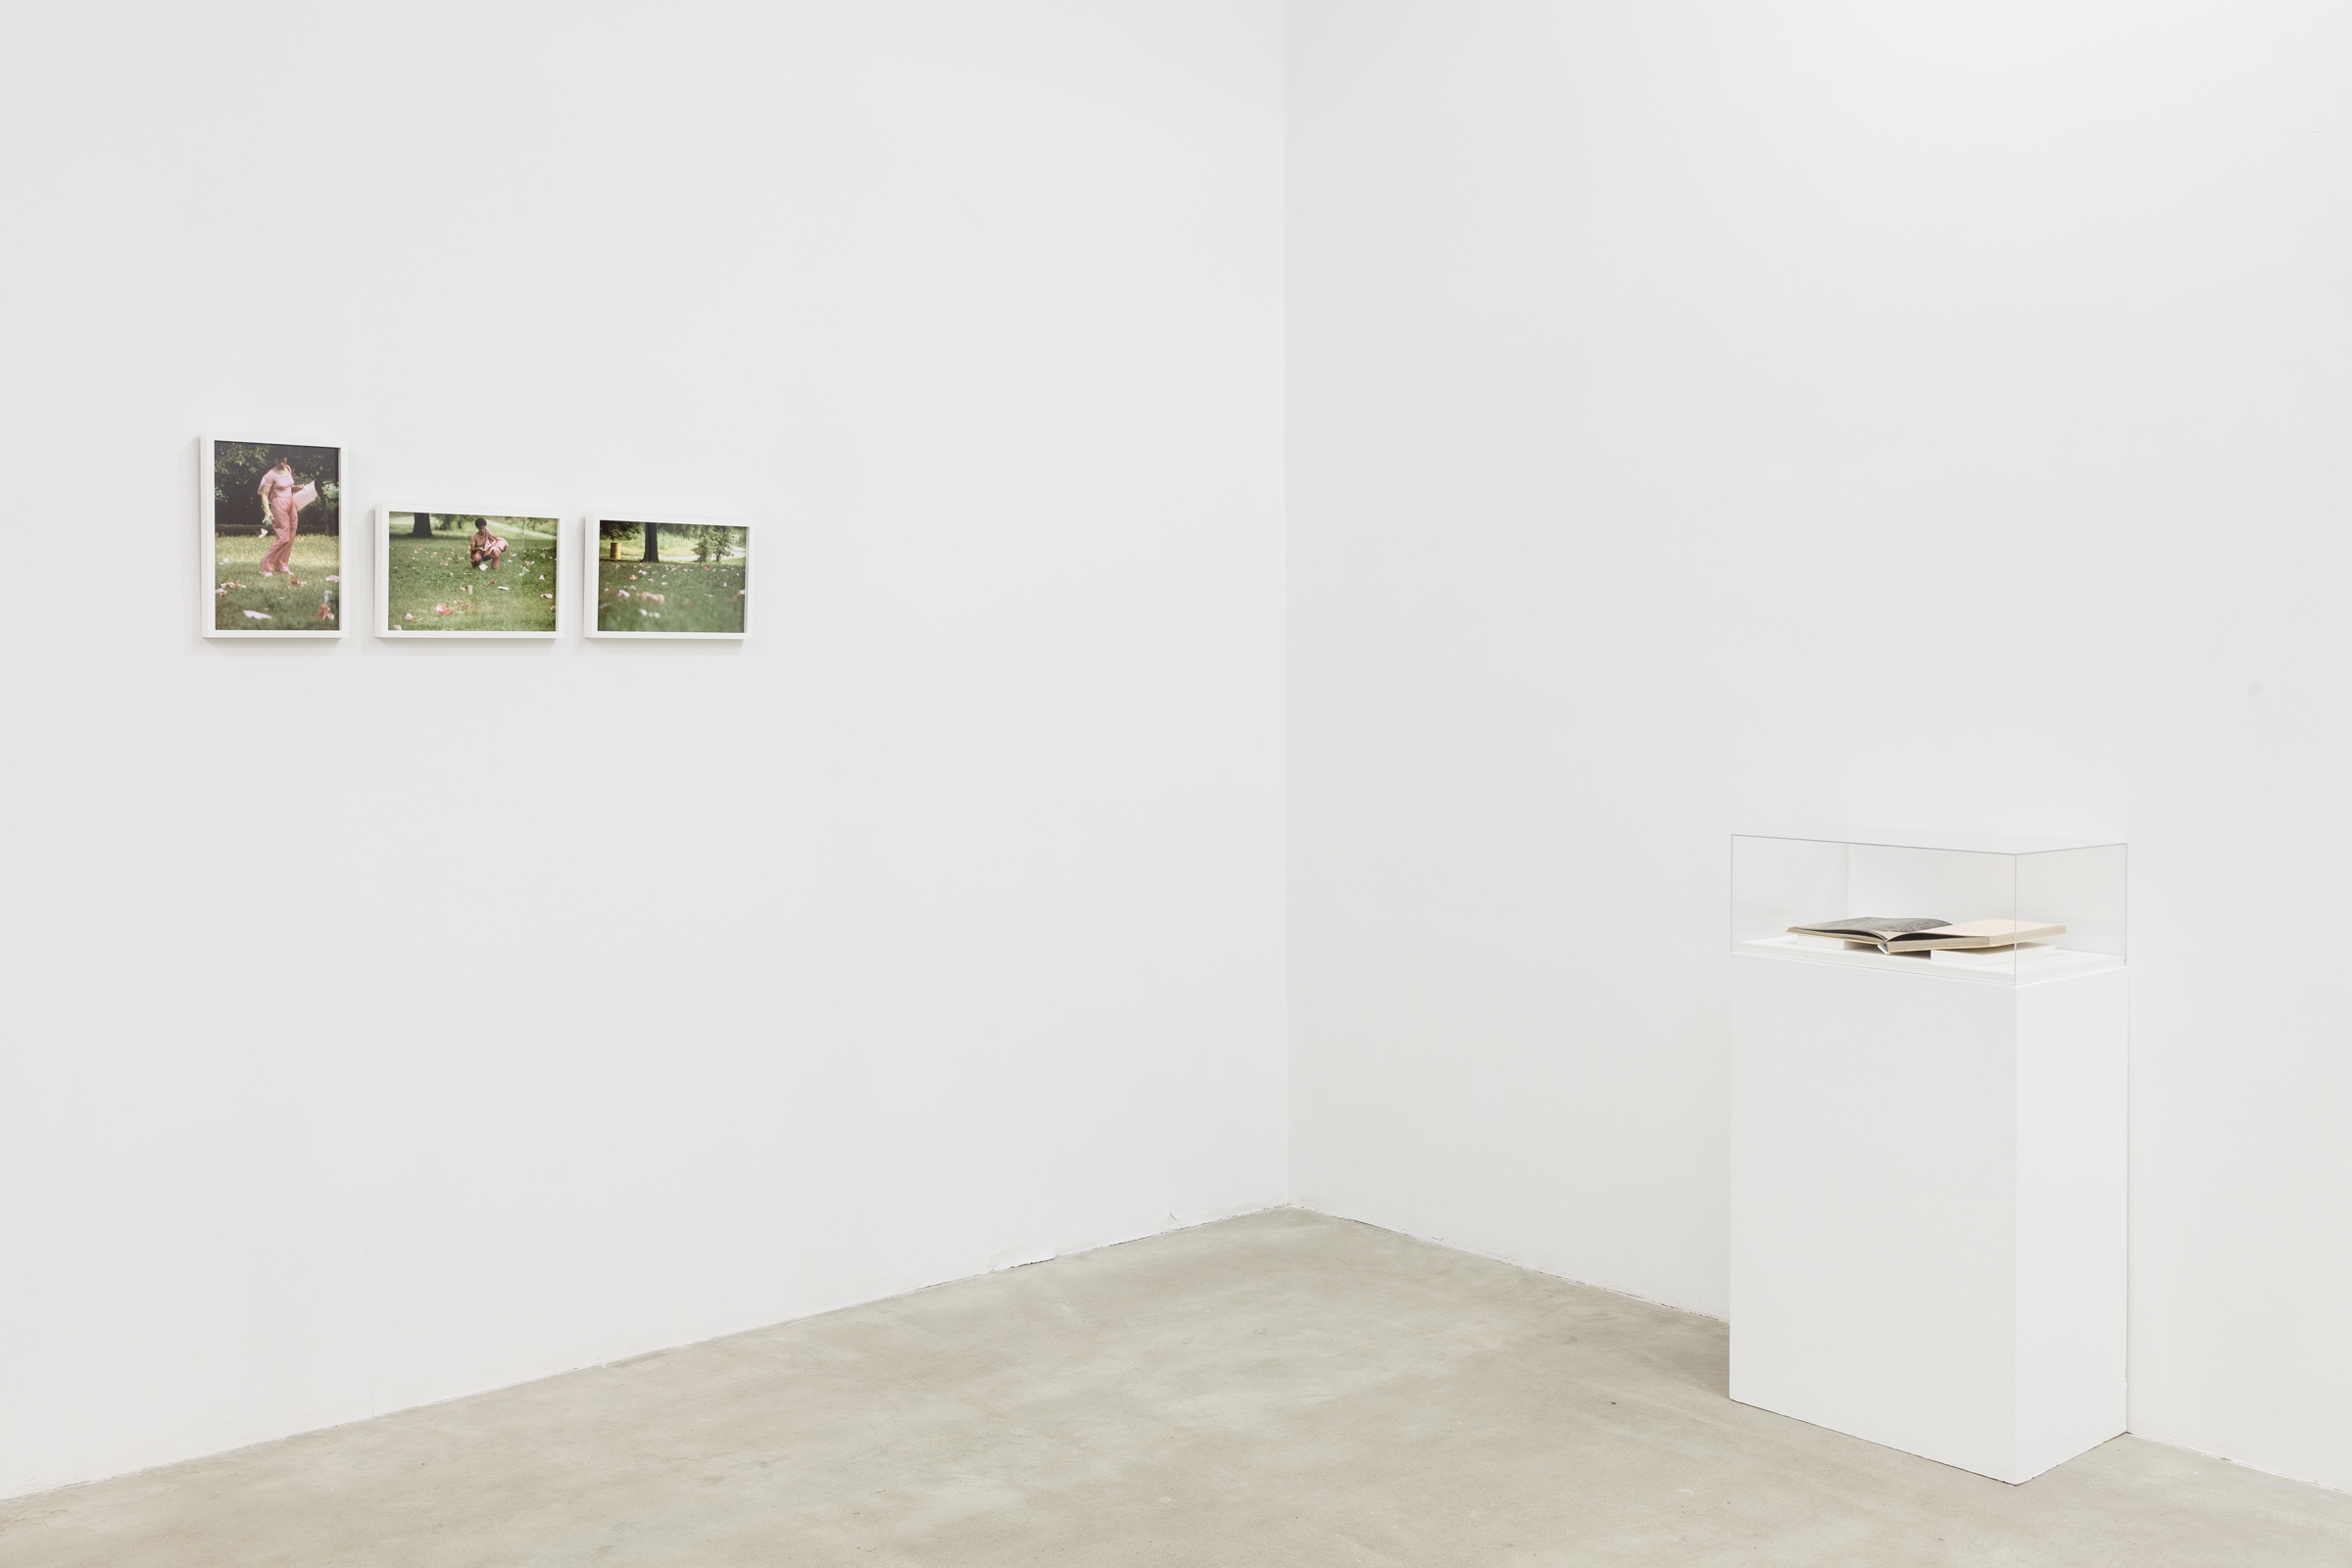 Installation view, Poor Working Conditions , Martos Gallery, New York, 2014